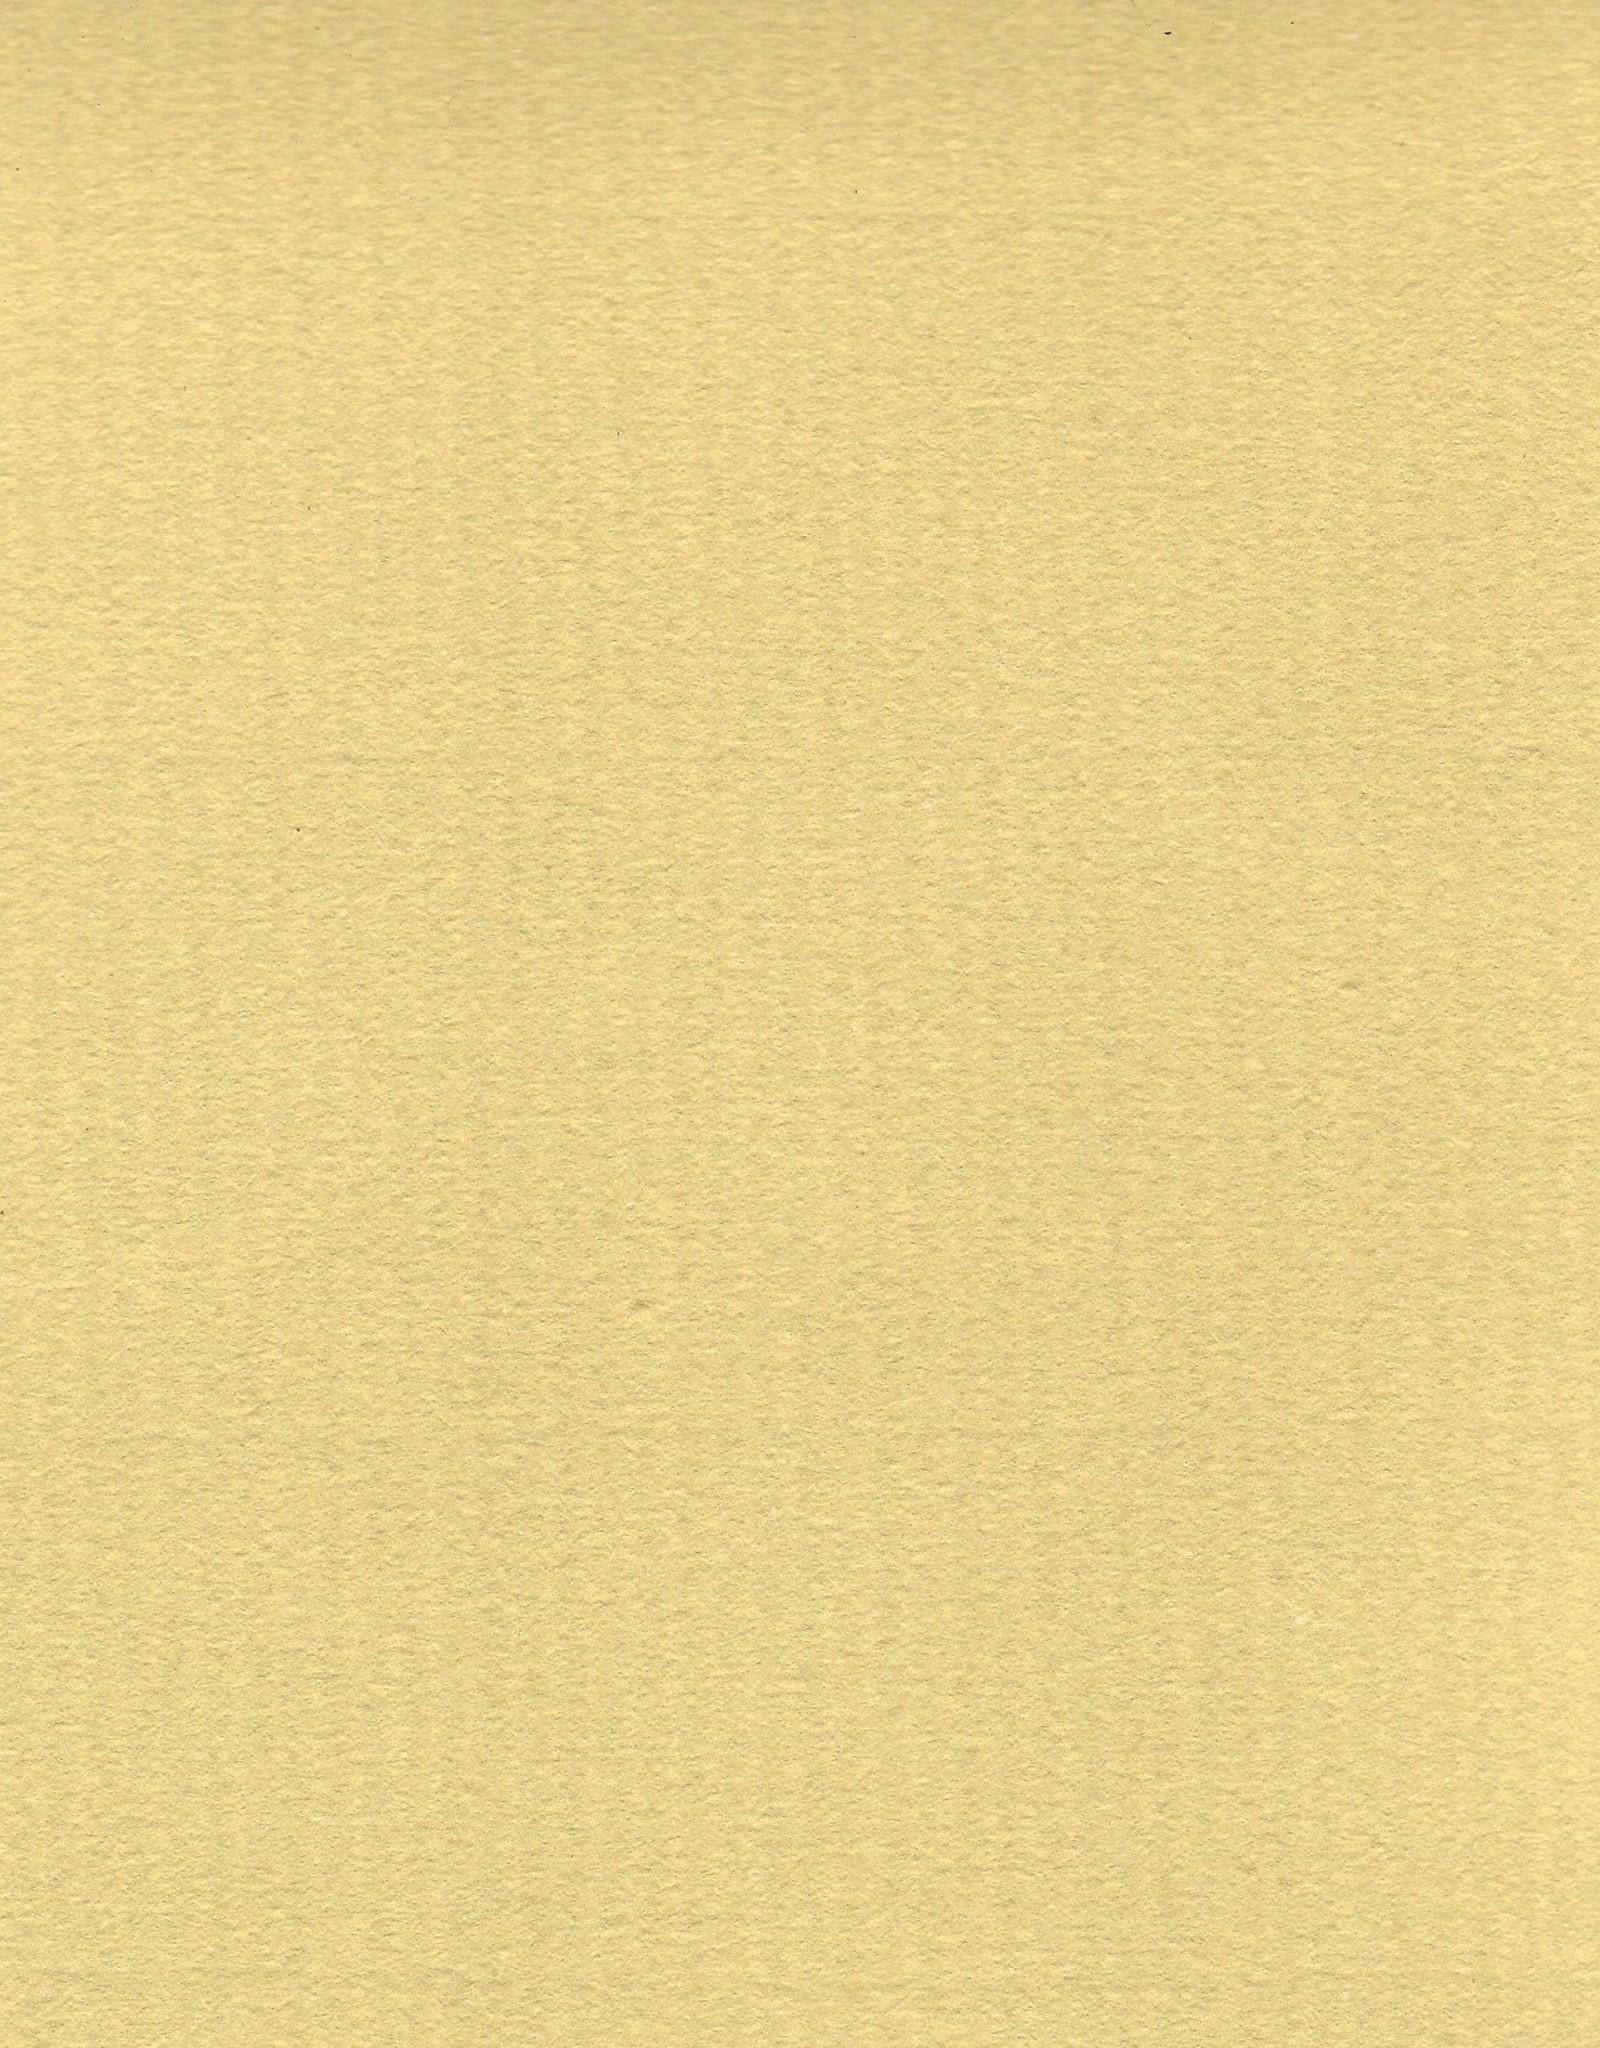 "Fabriano Roma Ivory/Buff (Rafello), 19"" x 26"", 130gr."